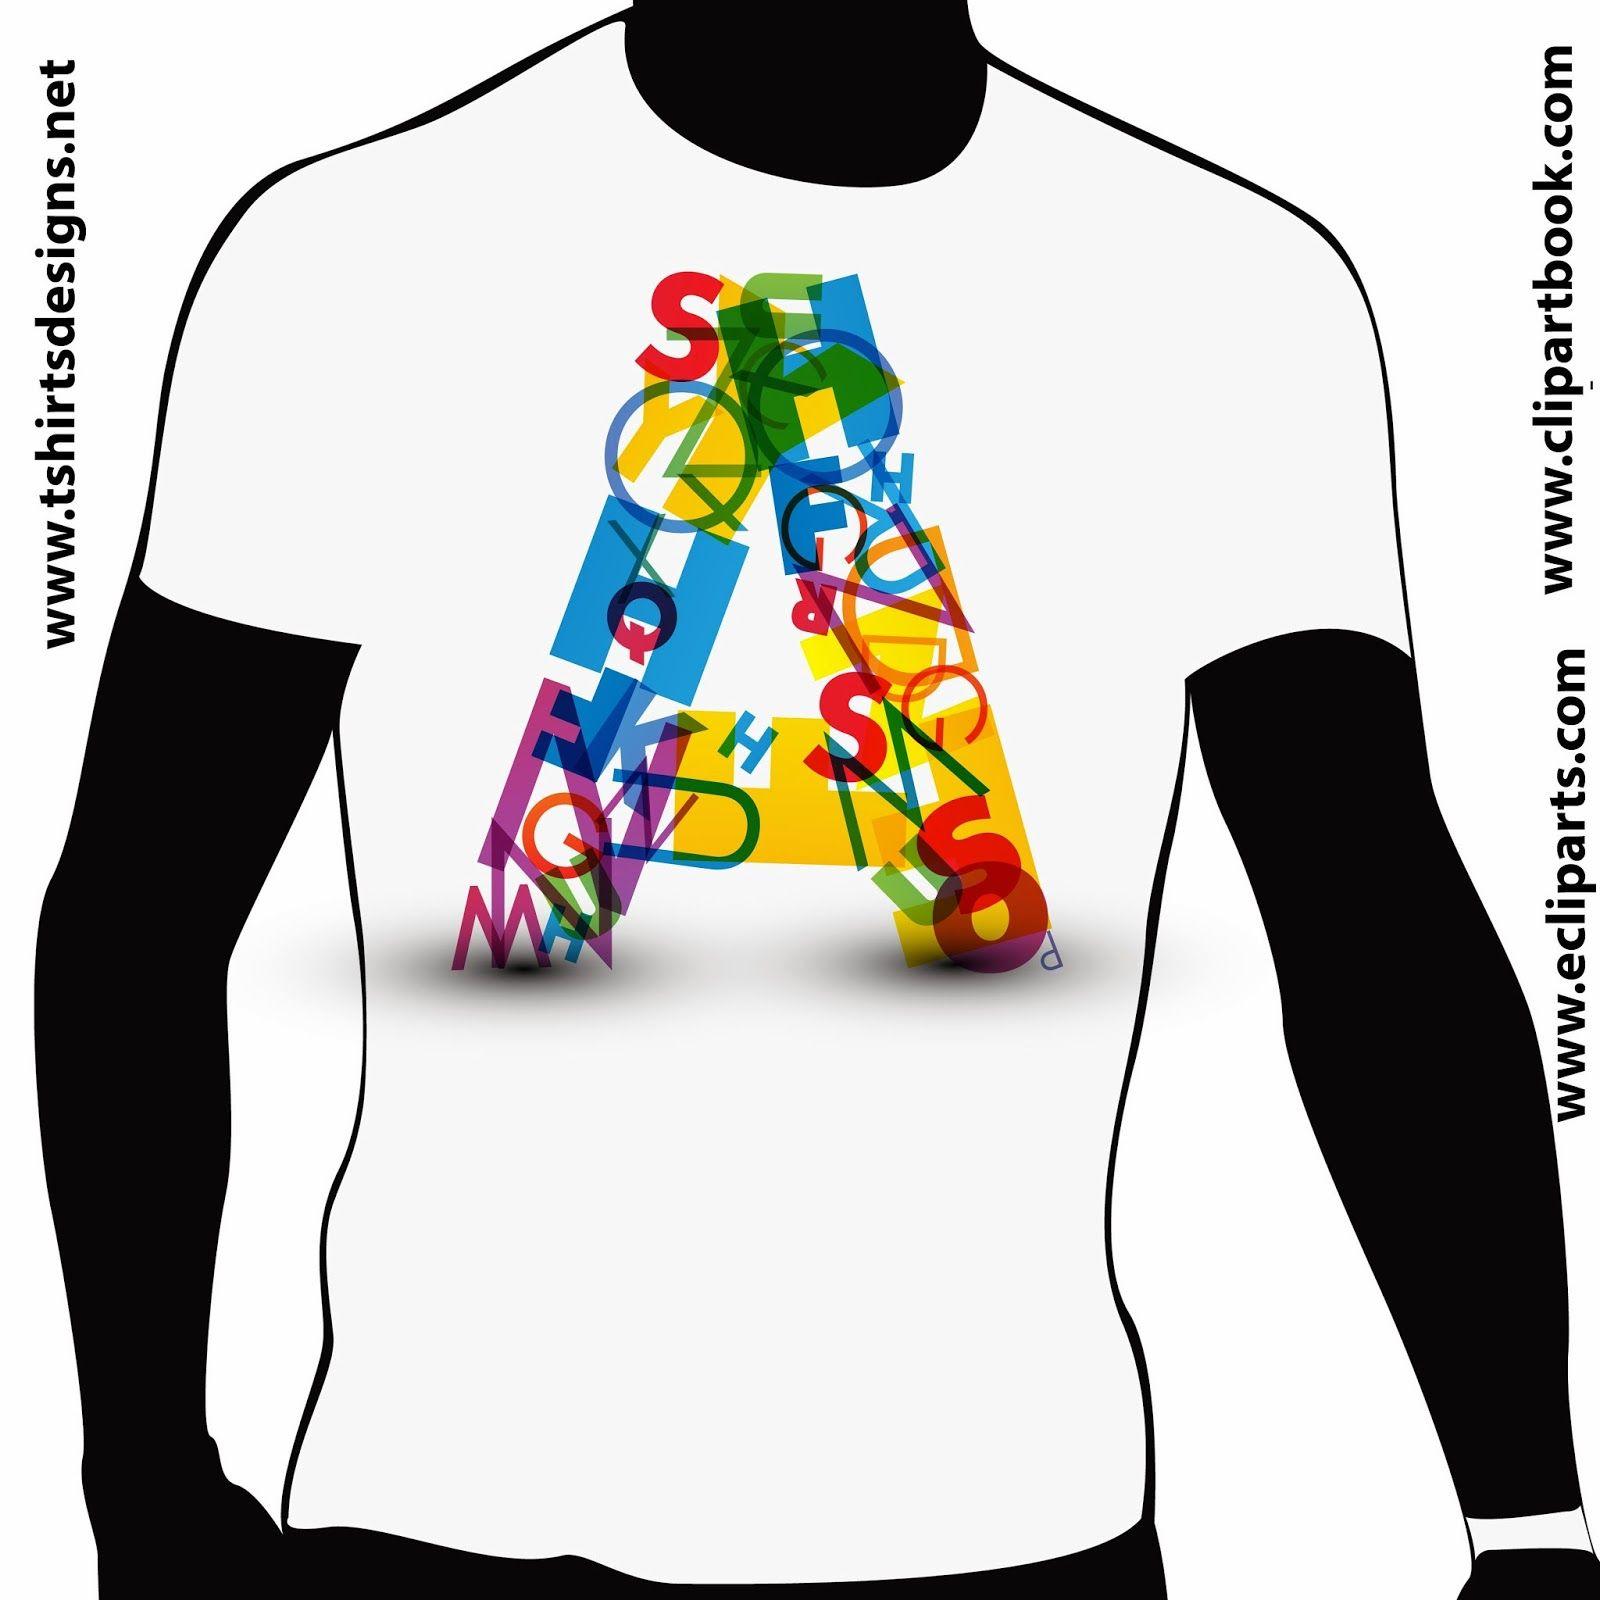 En customer account createpost/index.php/admin/Cms_Wysiwyg/directive - Index Php Admin Cms_wysiwyg Directive Index Download H M Black T Shirt